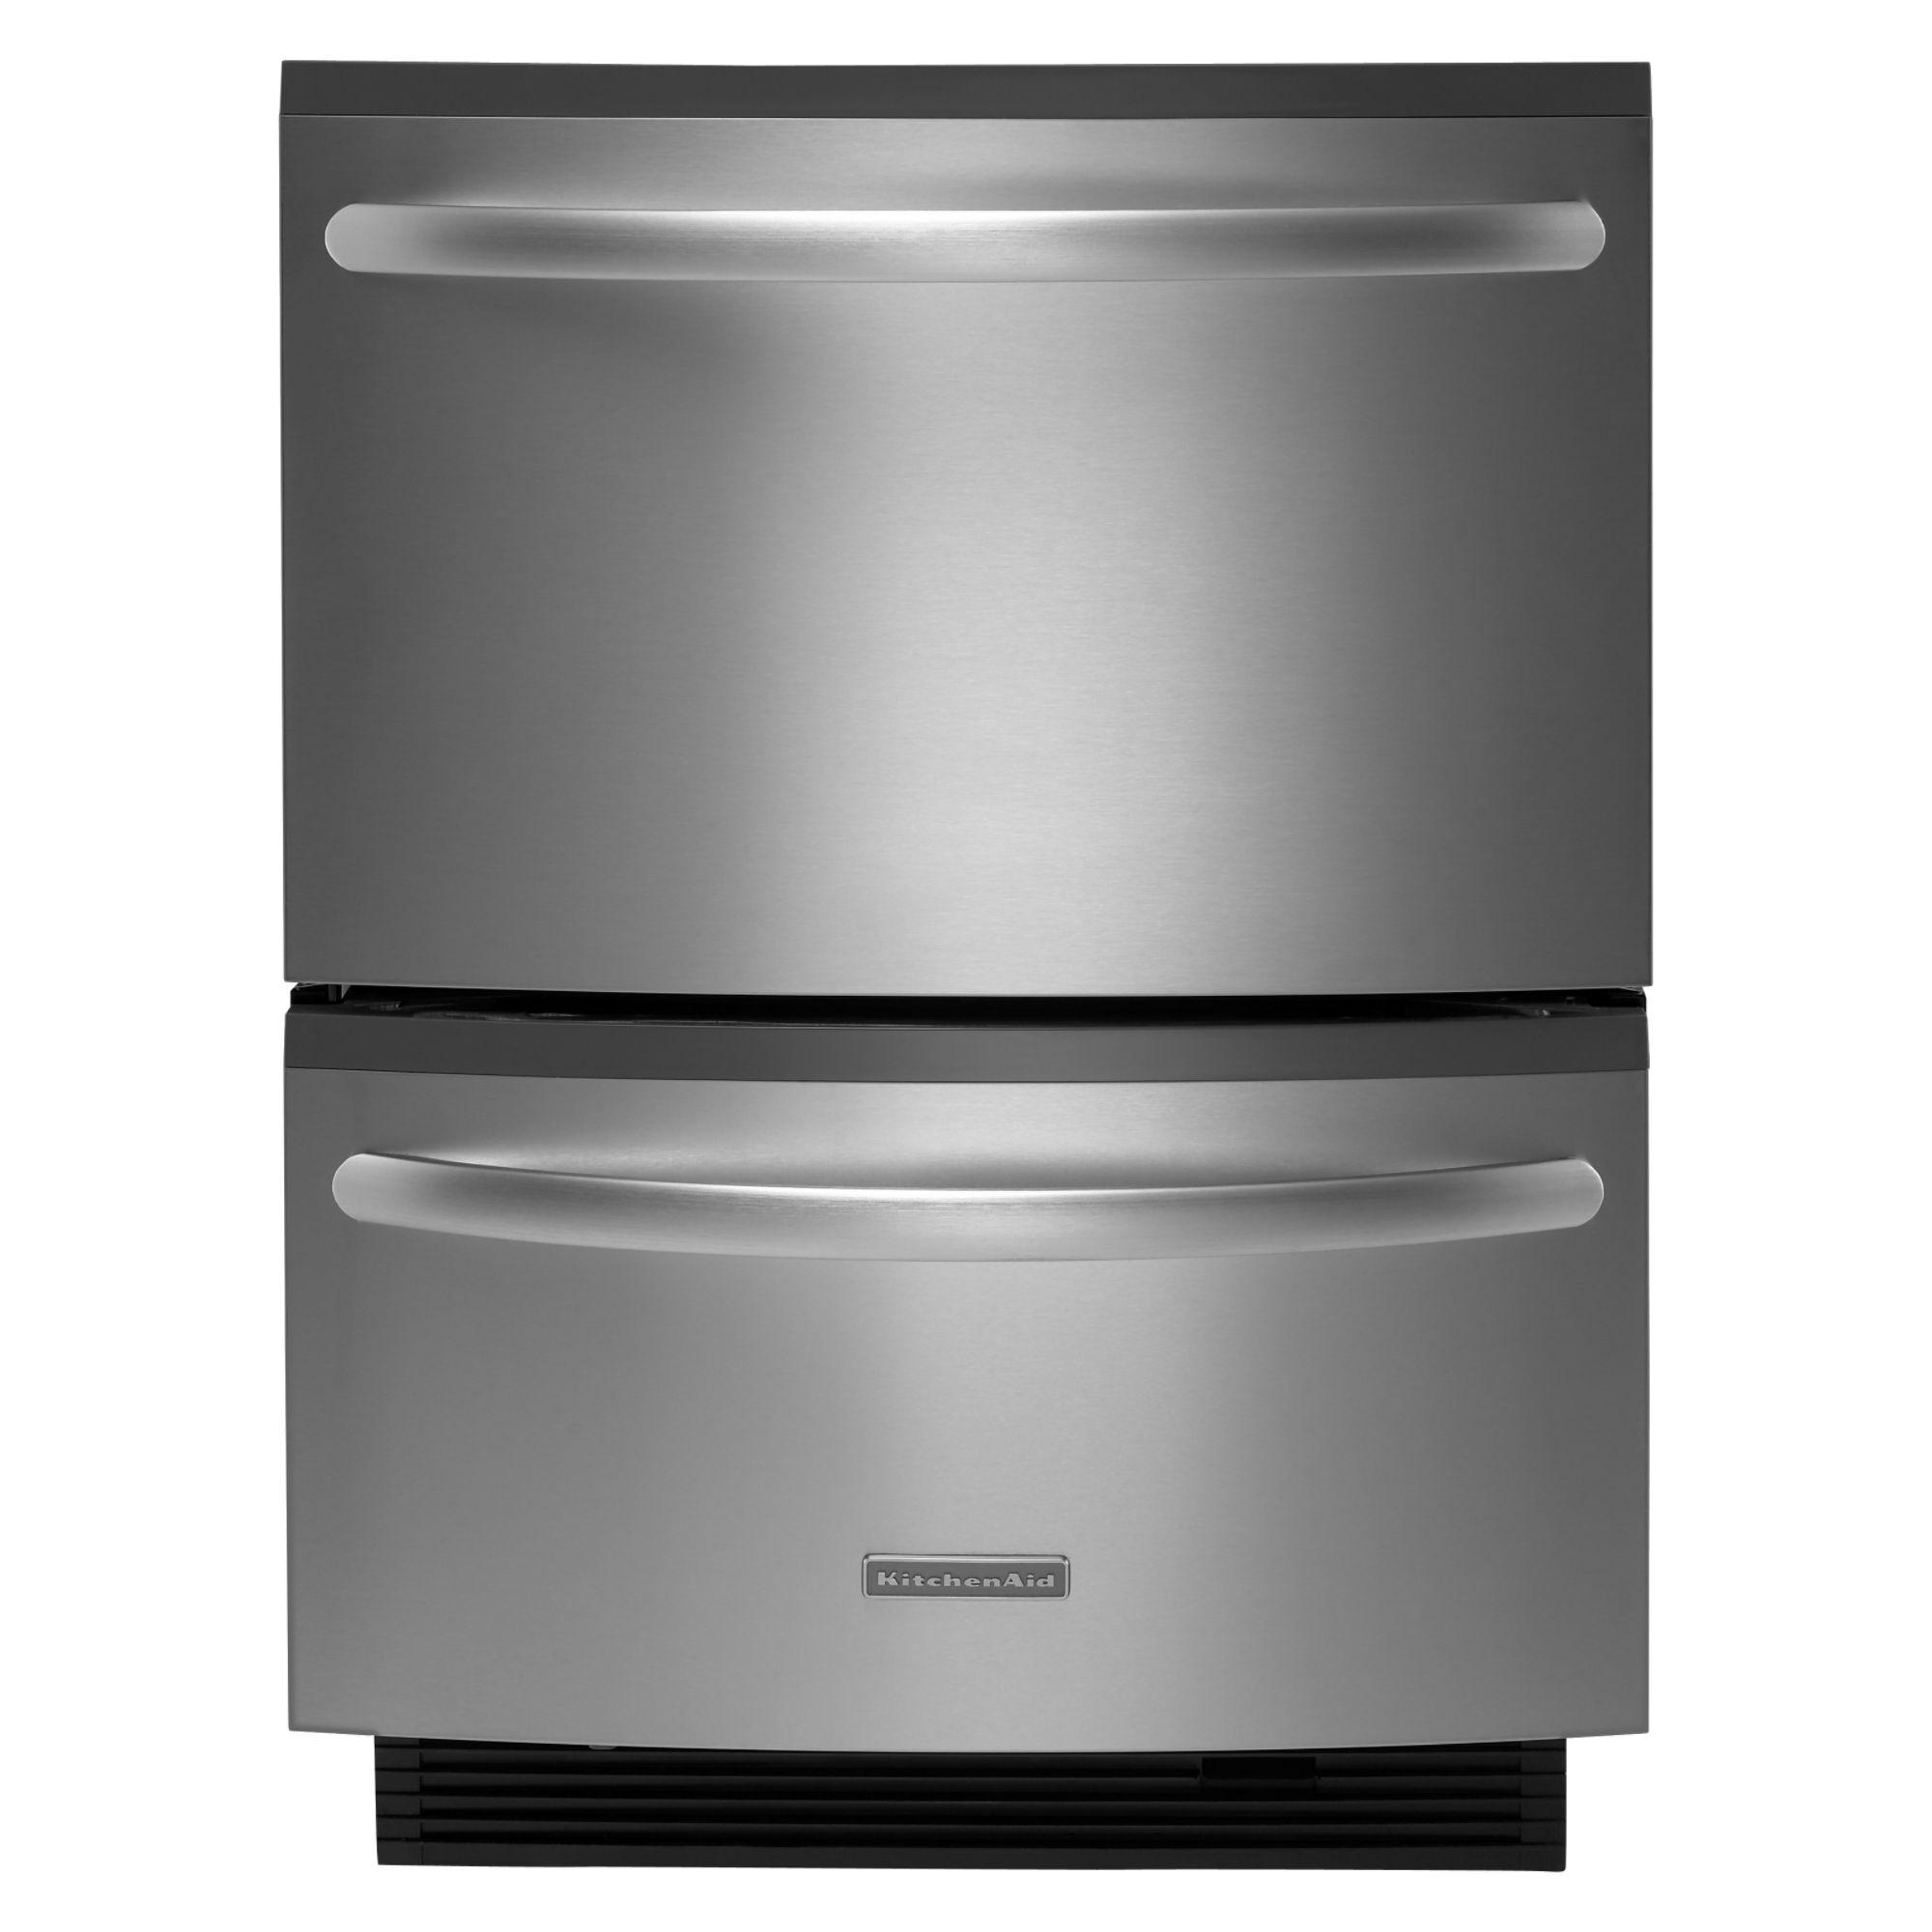 kitchenaid drawer dishwasher parts | model kudh03dtss2 | sears